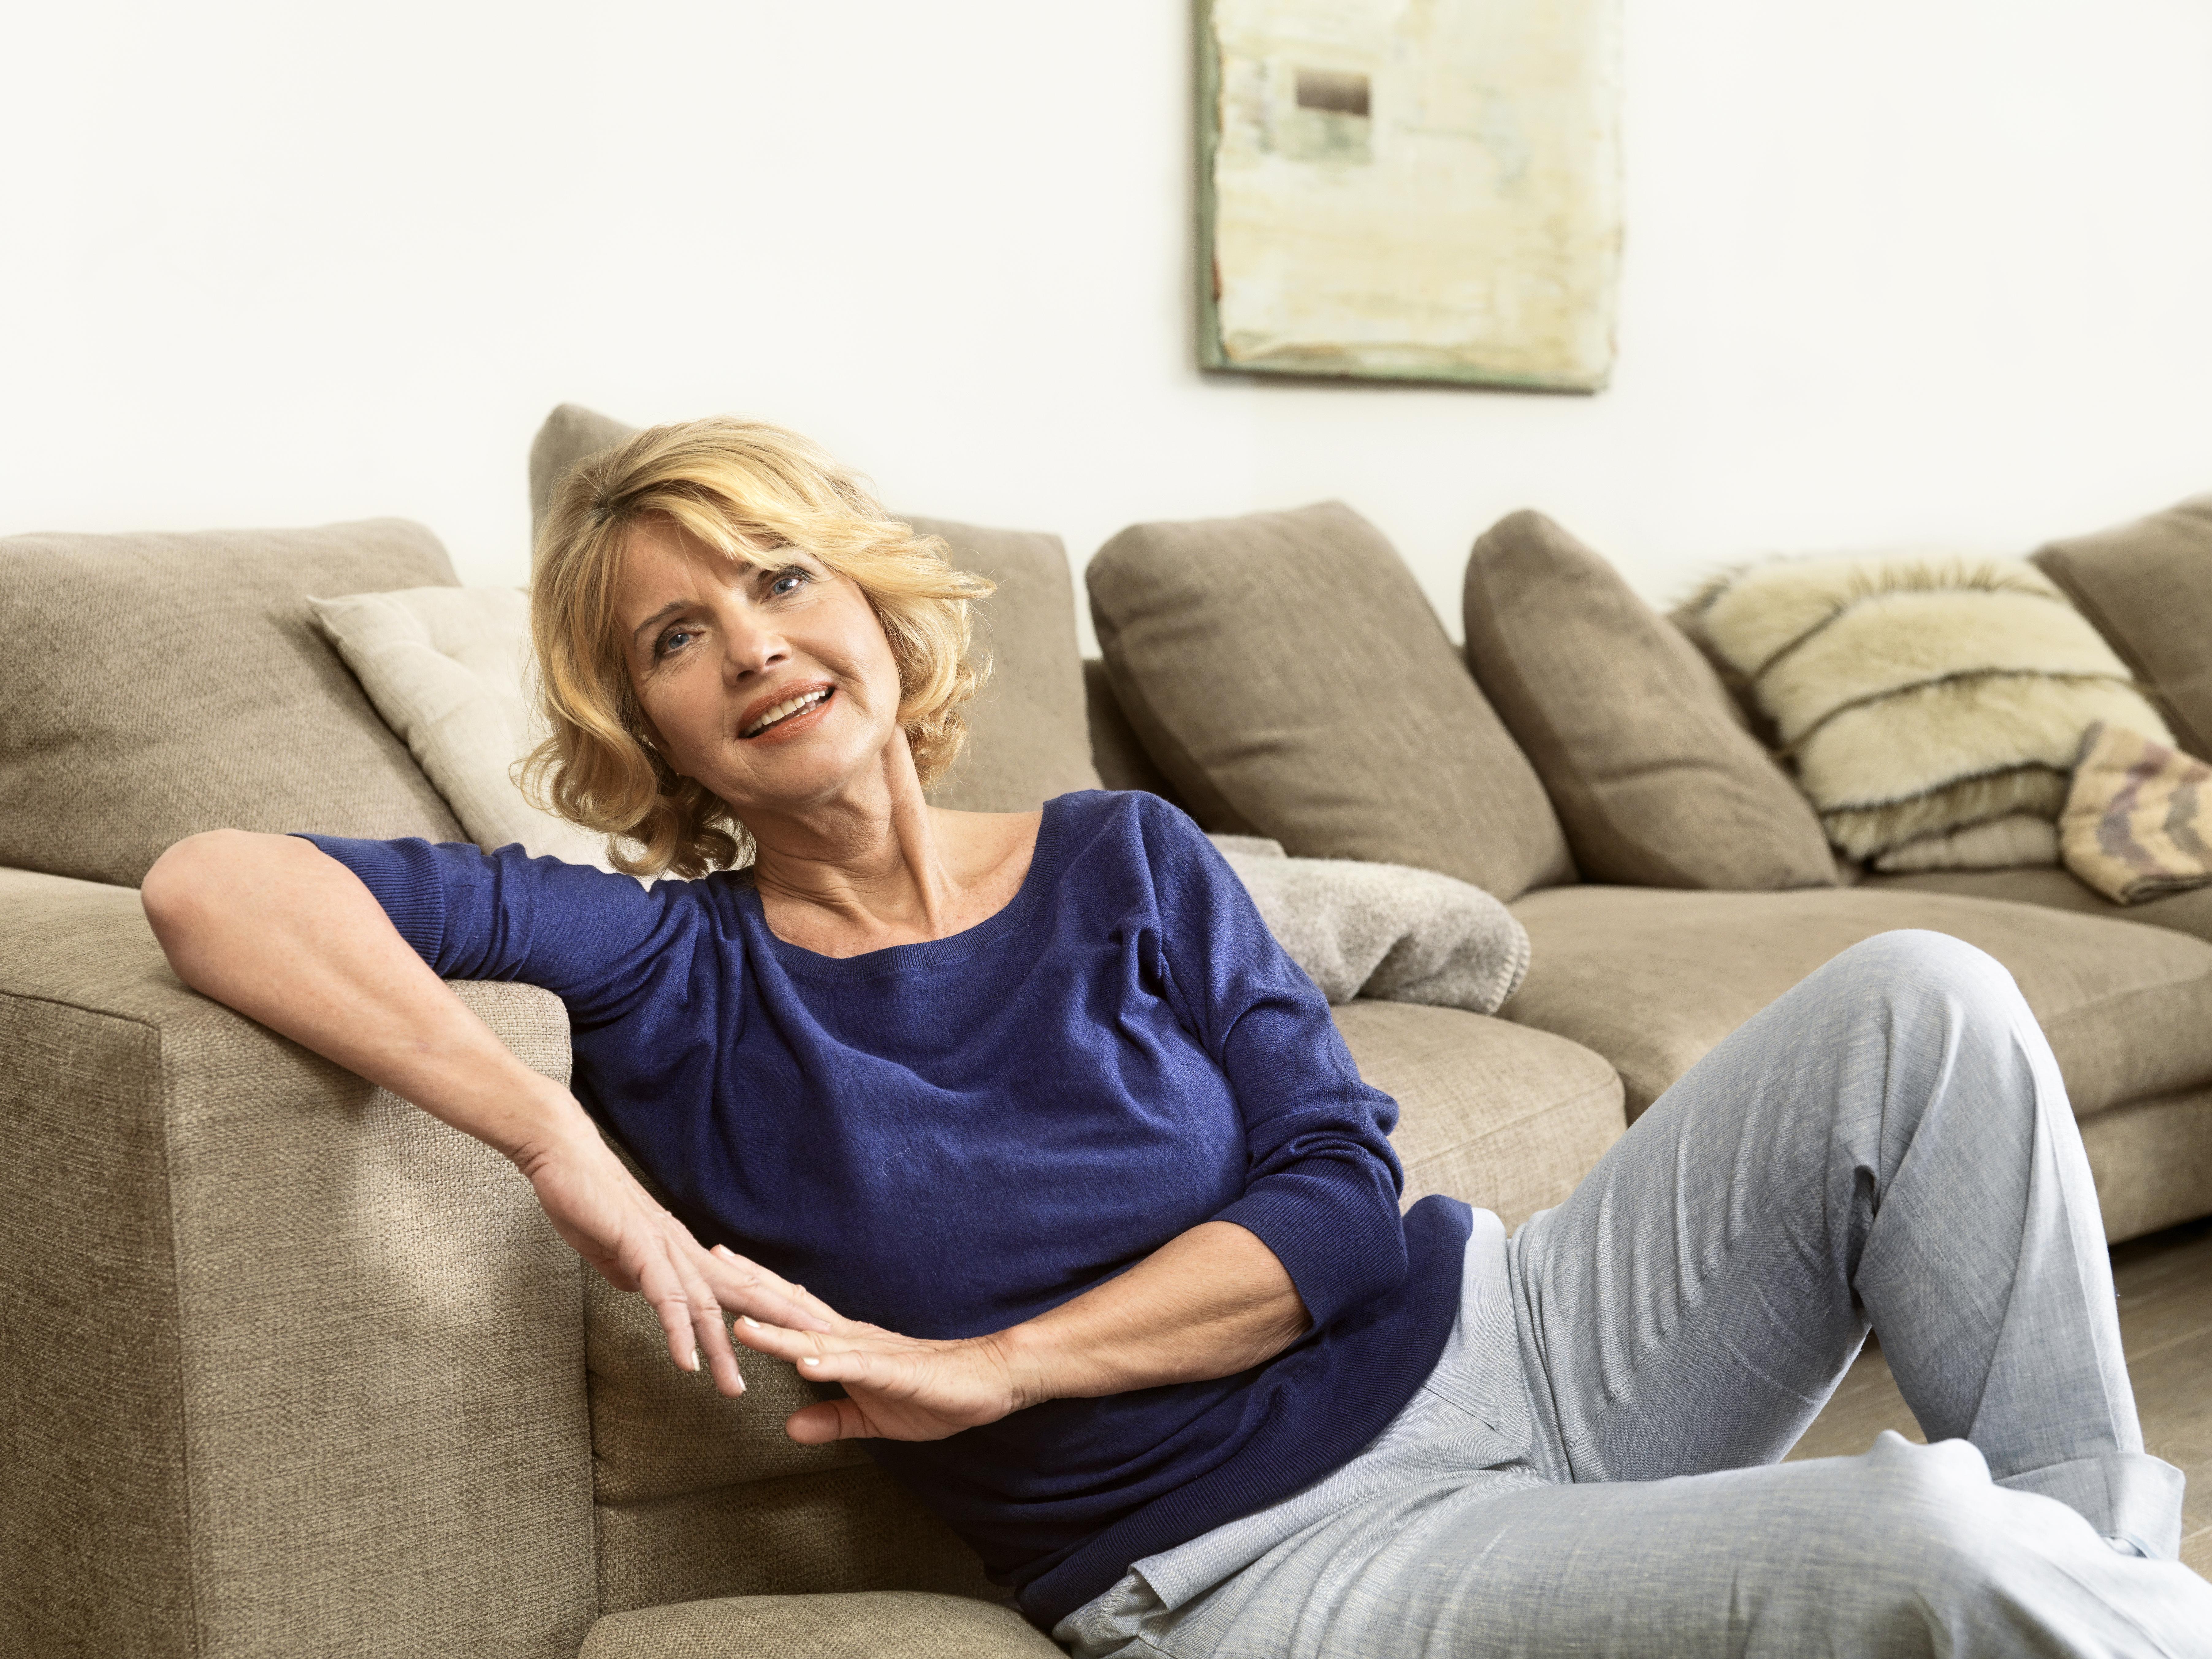 Aeltere Dame lehnt an einem Sofa